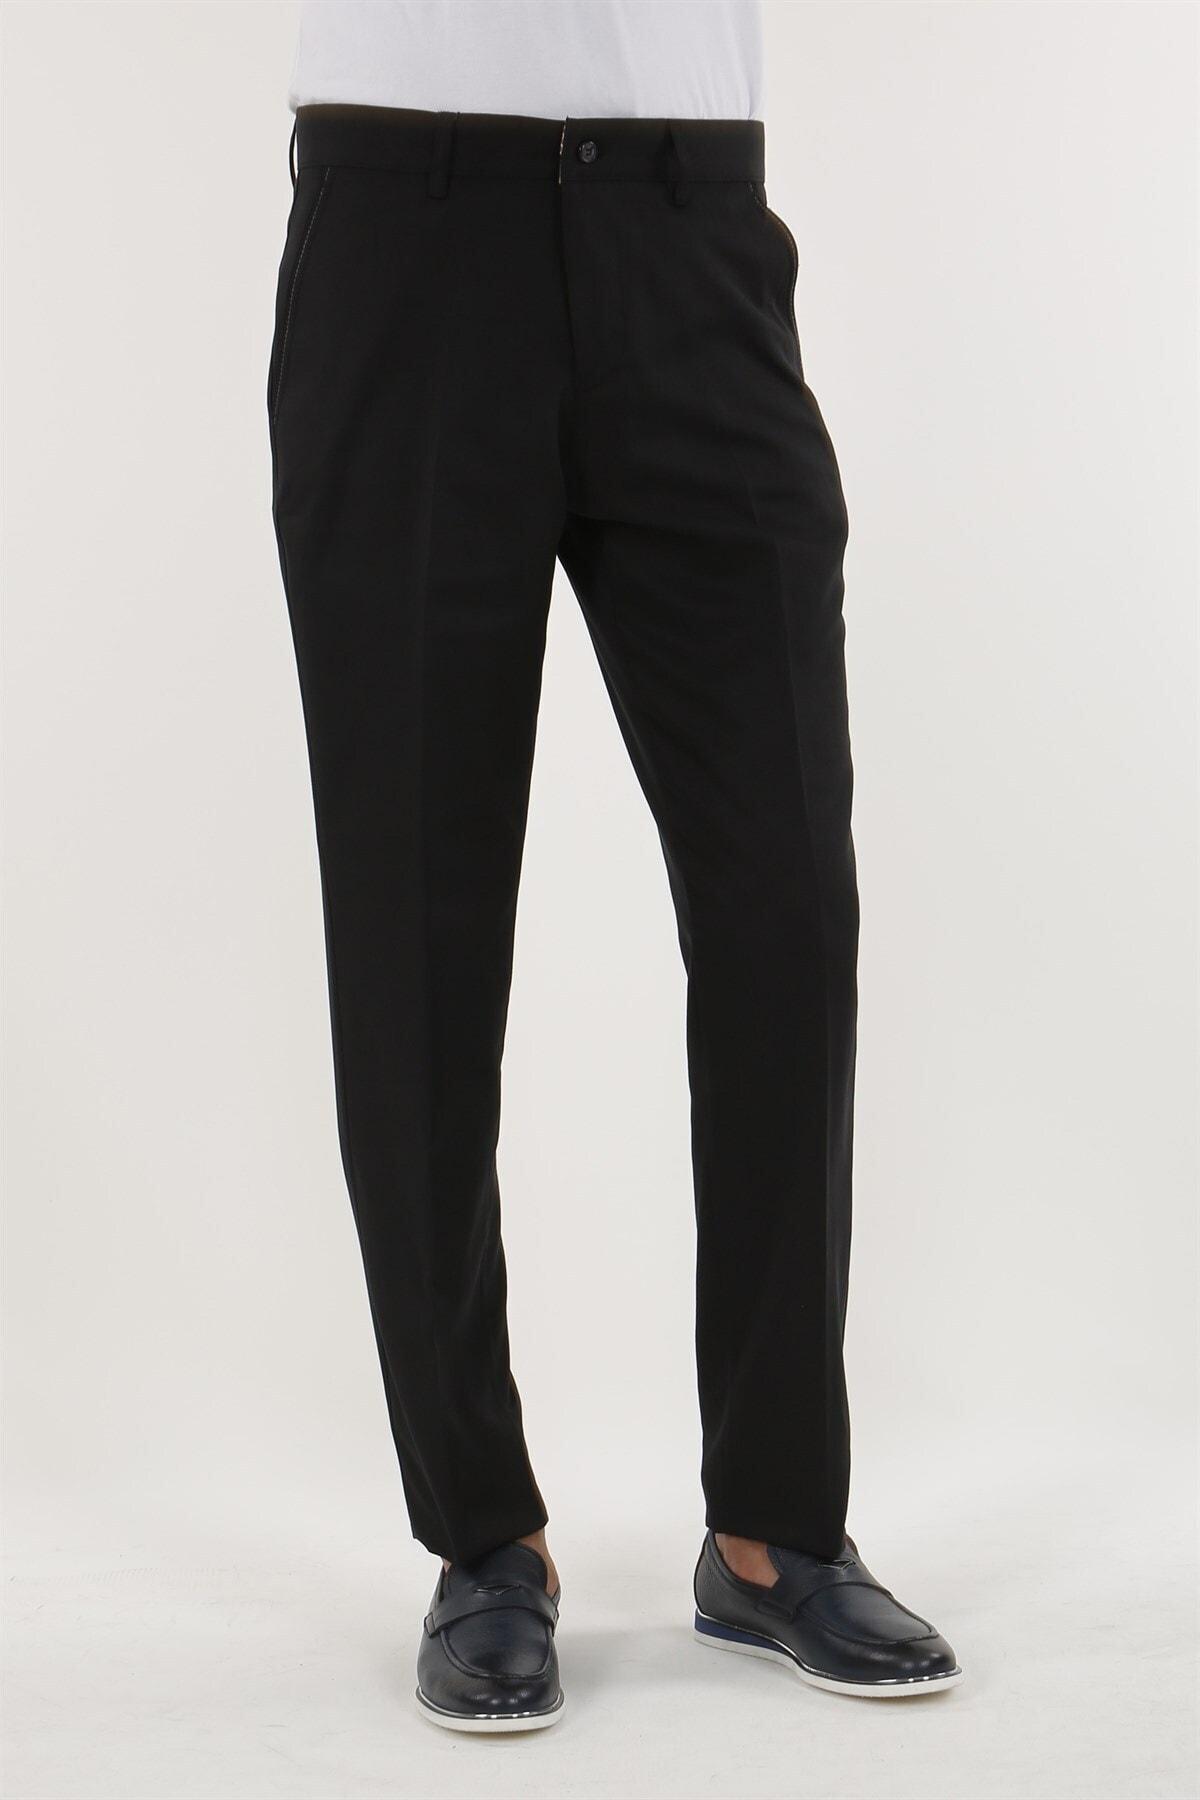 Jakamen Siyah Renk Klasik Kalıp Erkek Pantolon 2